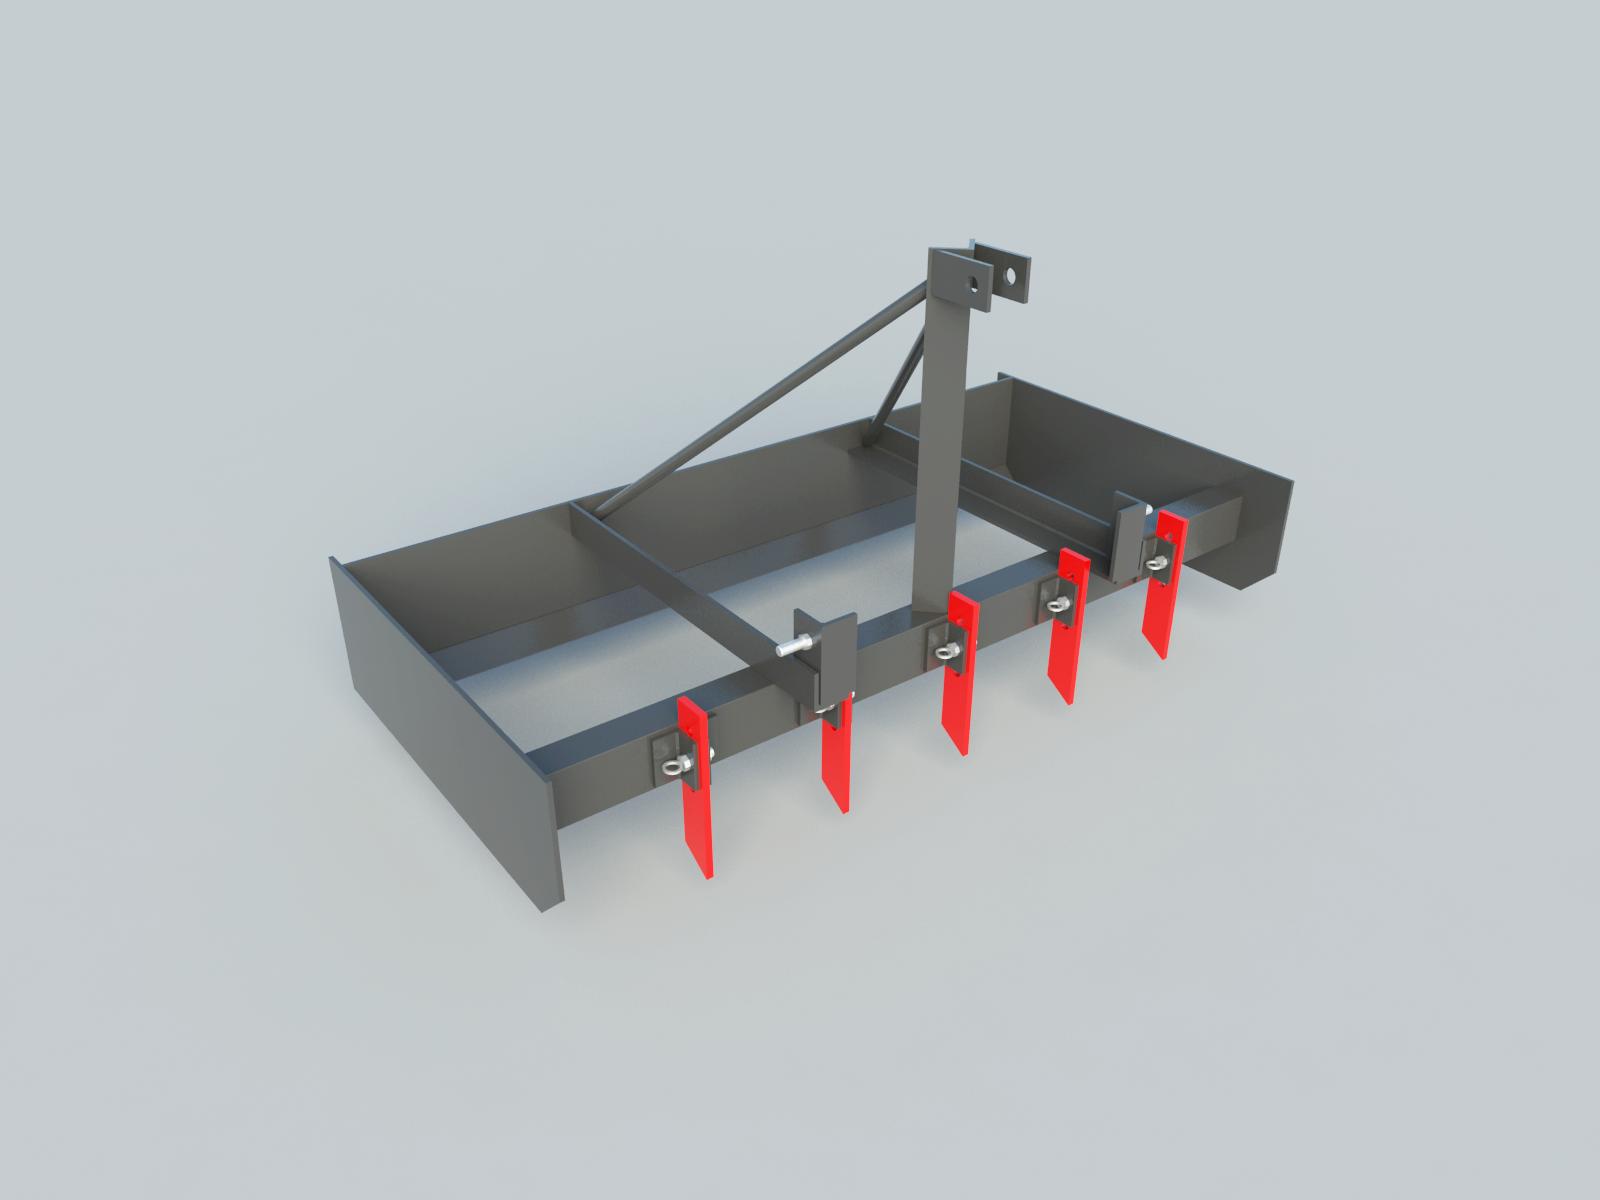 build your own 3pt box blade diy plans fun to build  [ 1600 x 1200 Pixel ]